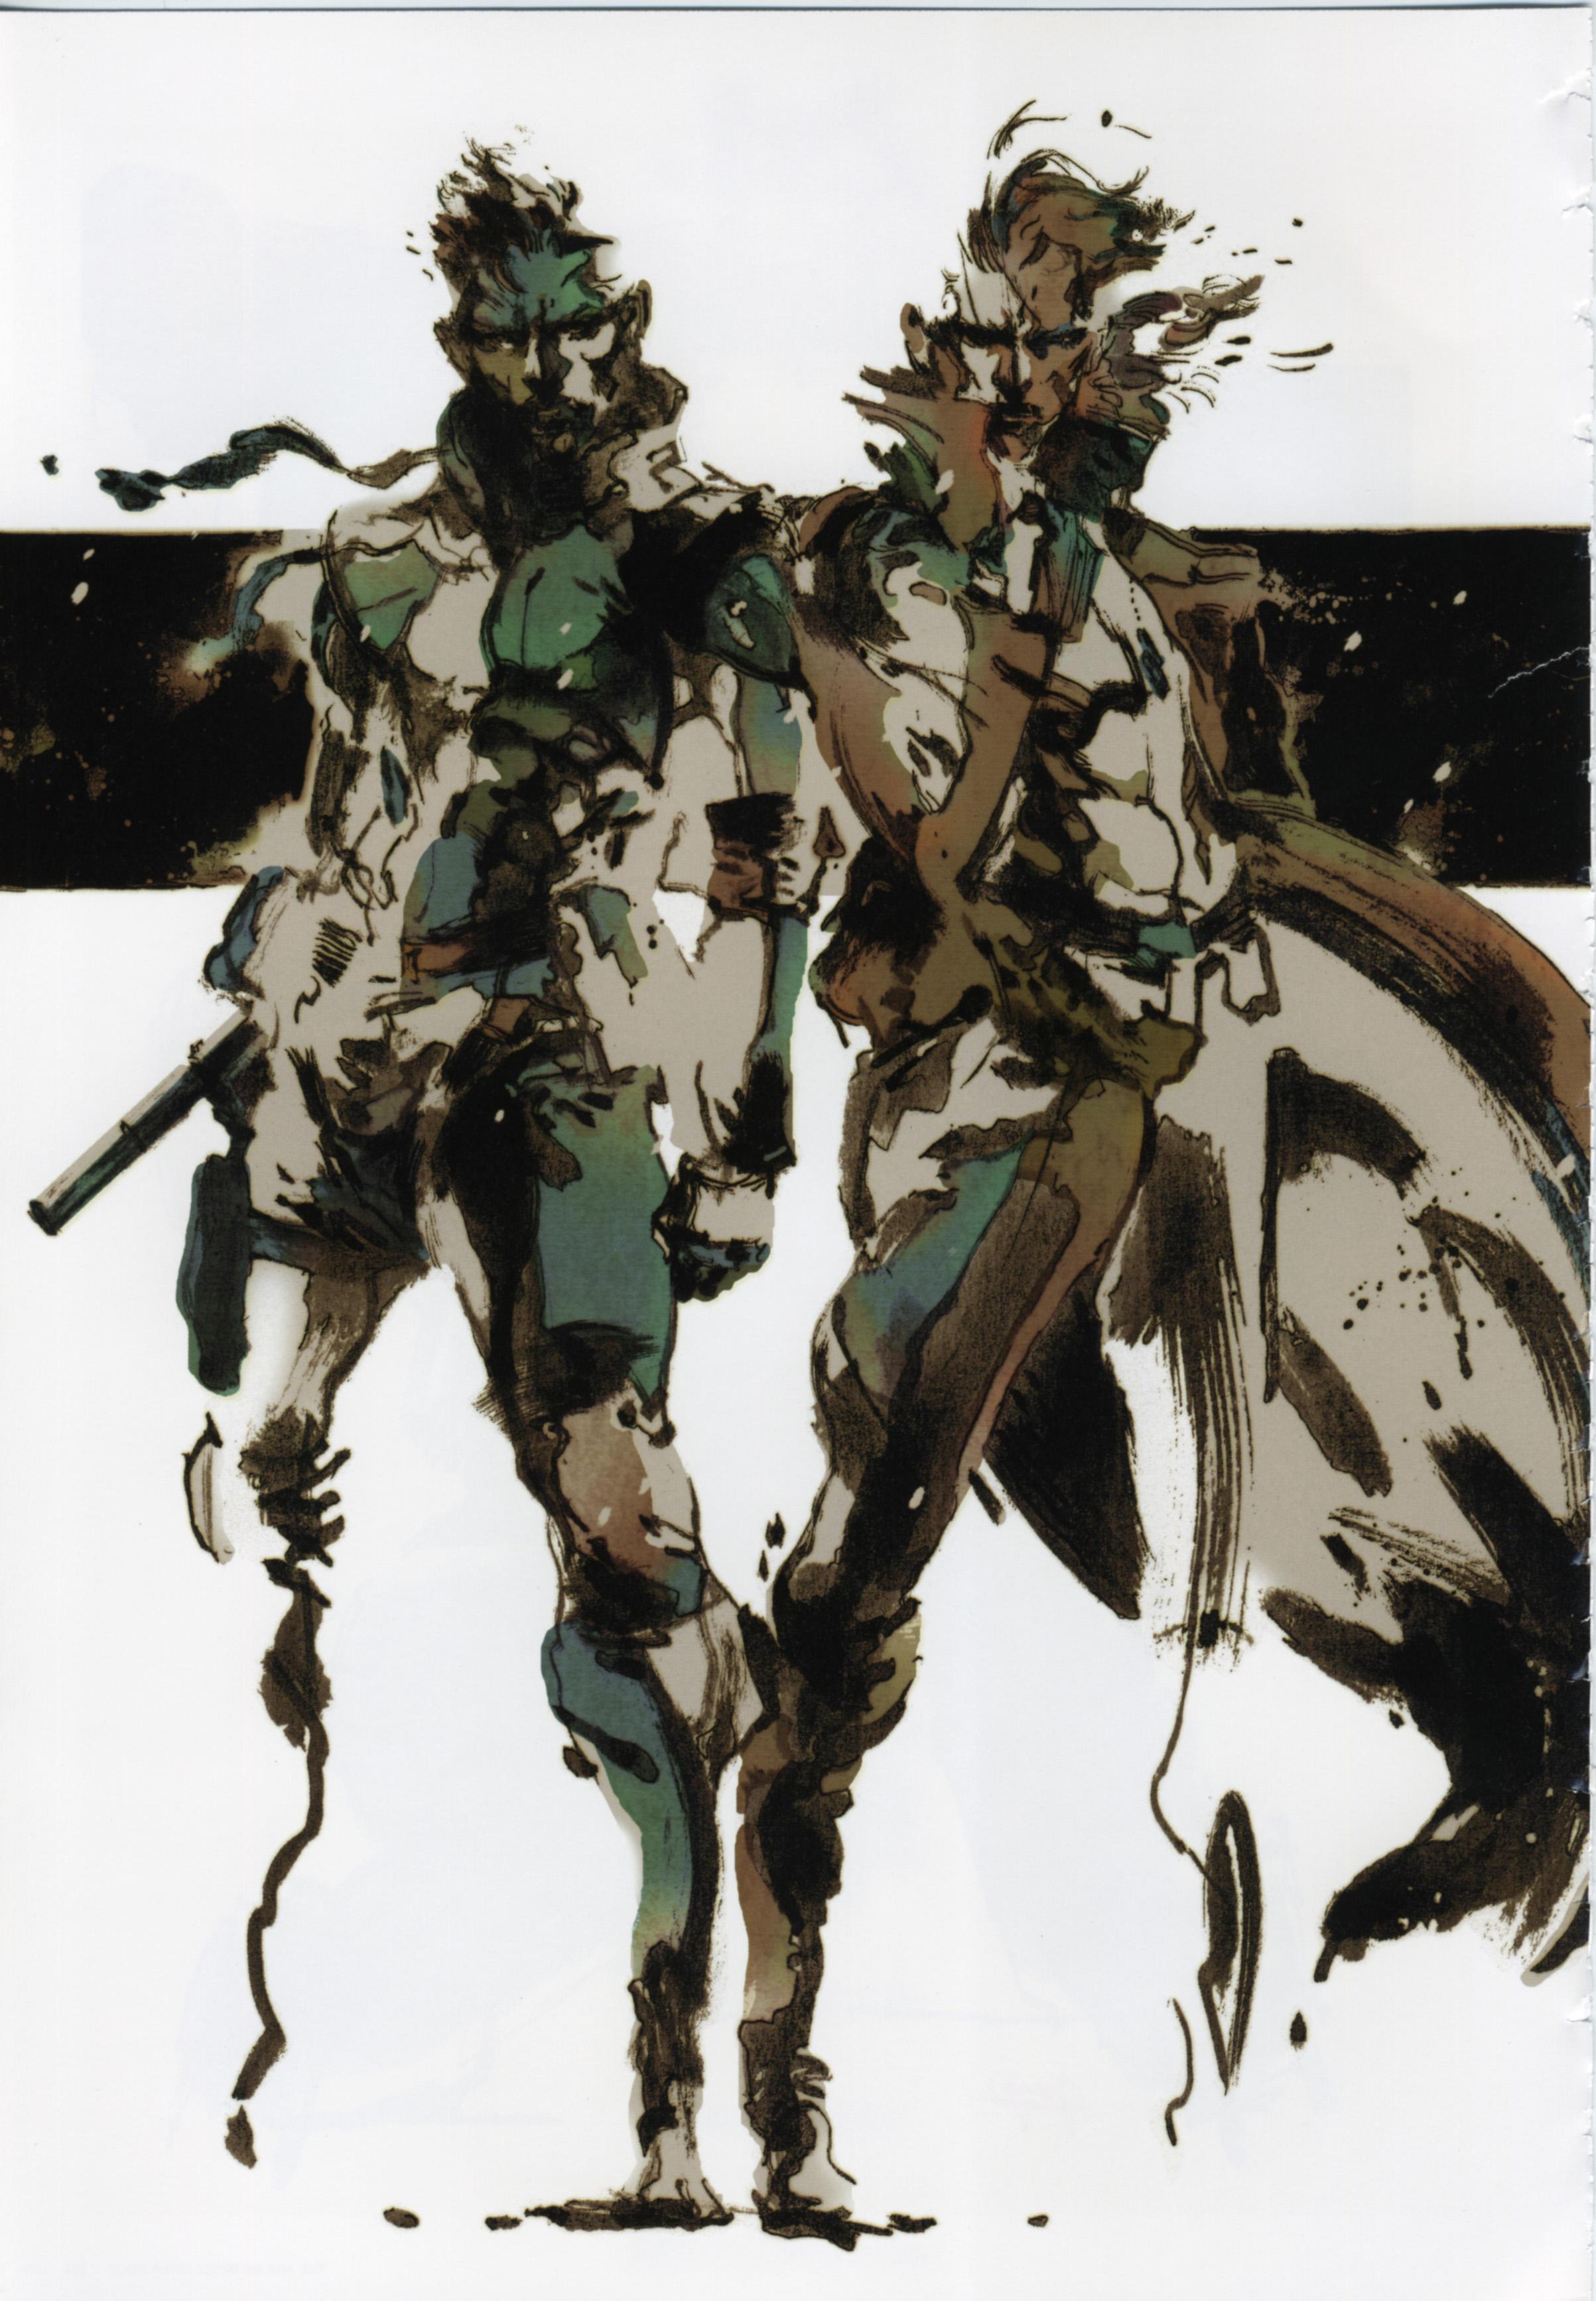 Metal Gear Solid Art Of Mgs 04 Minitokyo